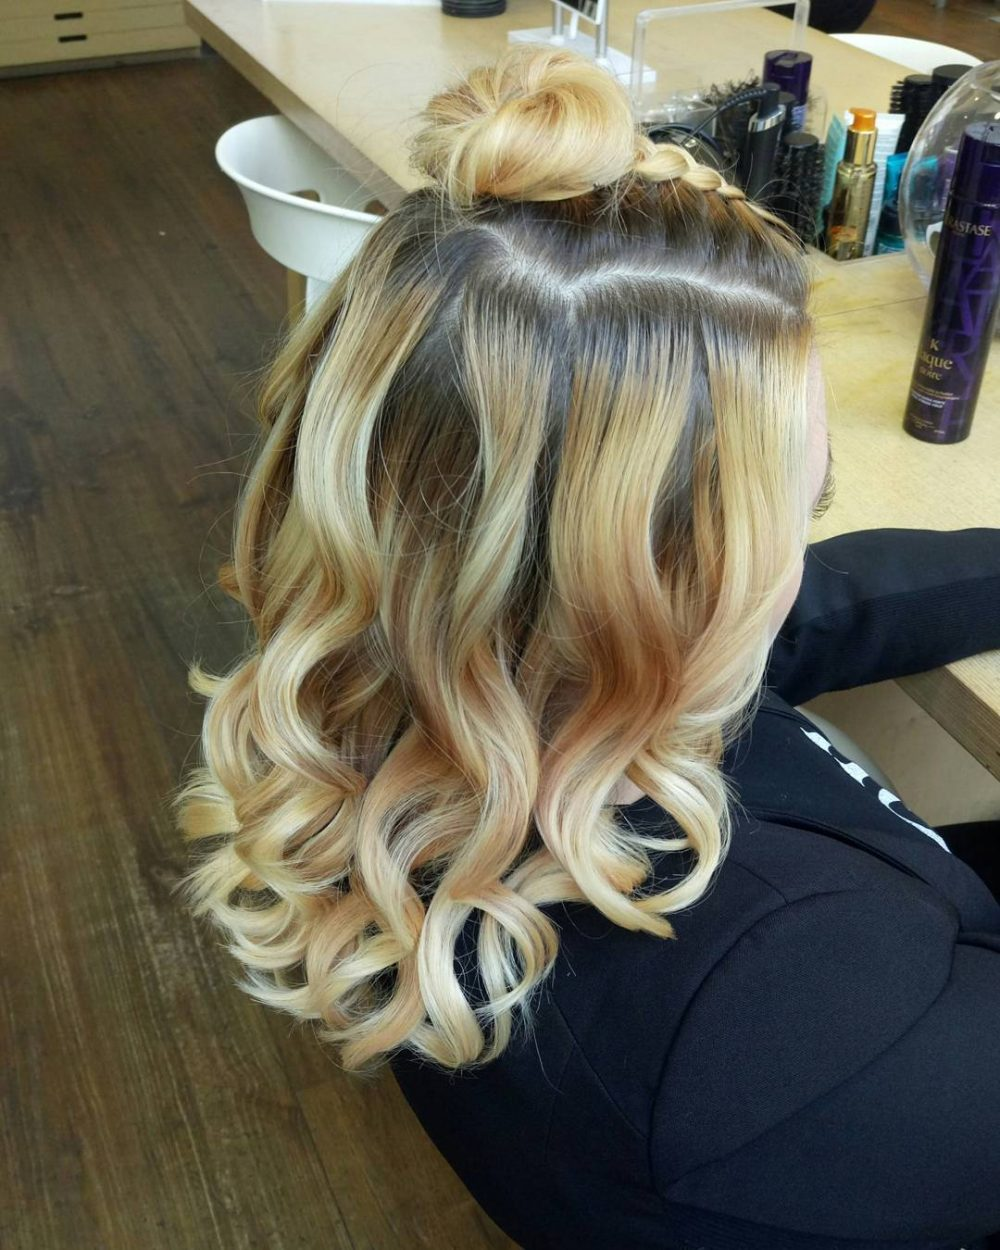 28 Cute Hairstyles For Medium Length Hair (Popular For 2018